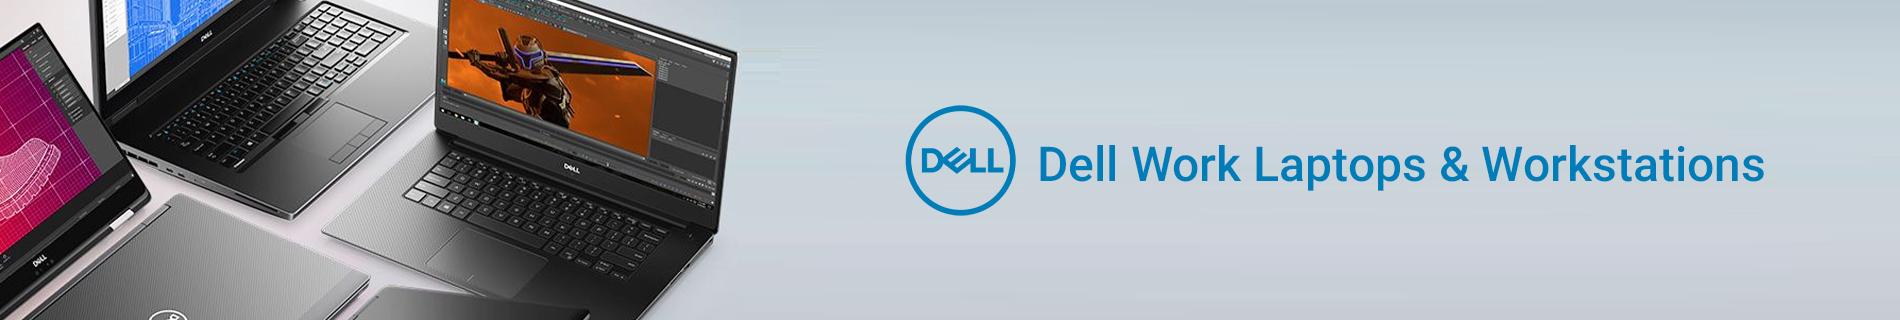 Dell Work Landing Page Revamp Dell For Work Laptops Banner